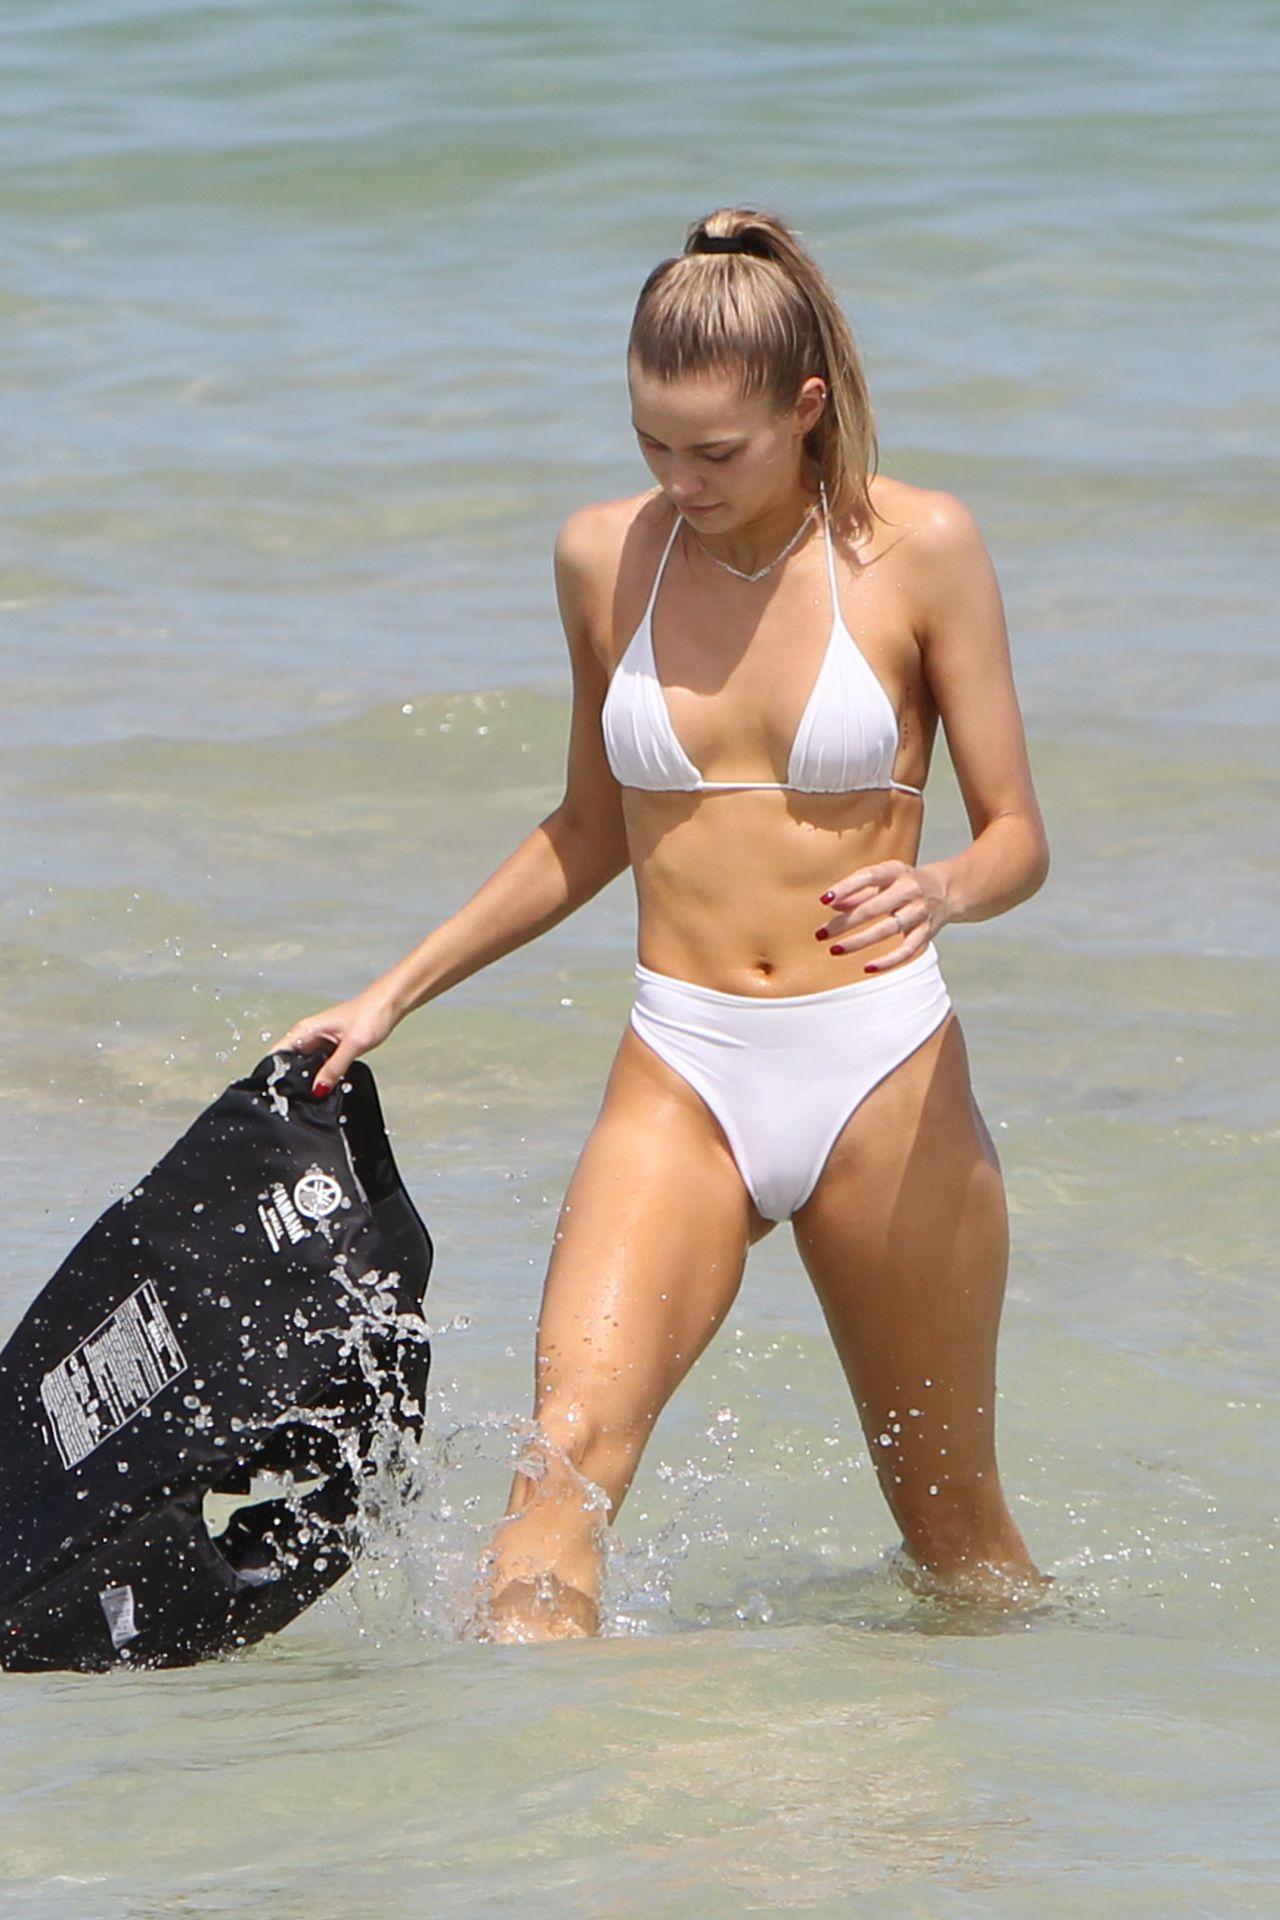 Josie Canseco In Bikini Miami Beach 07 24 2017